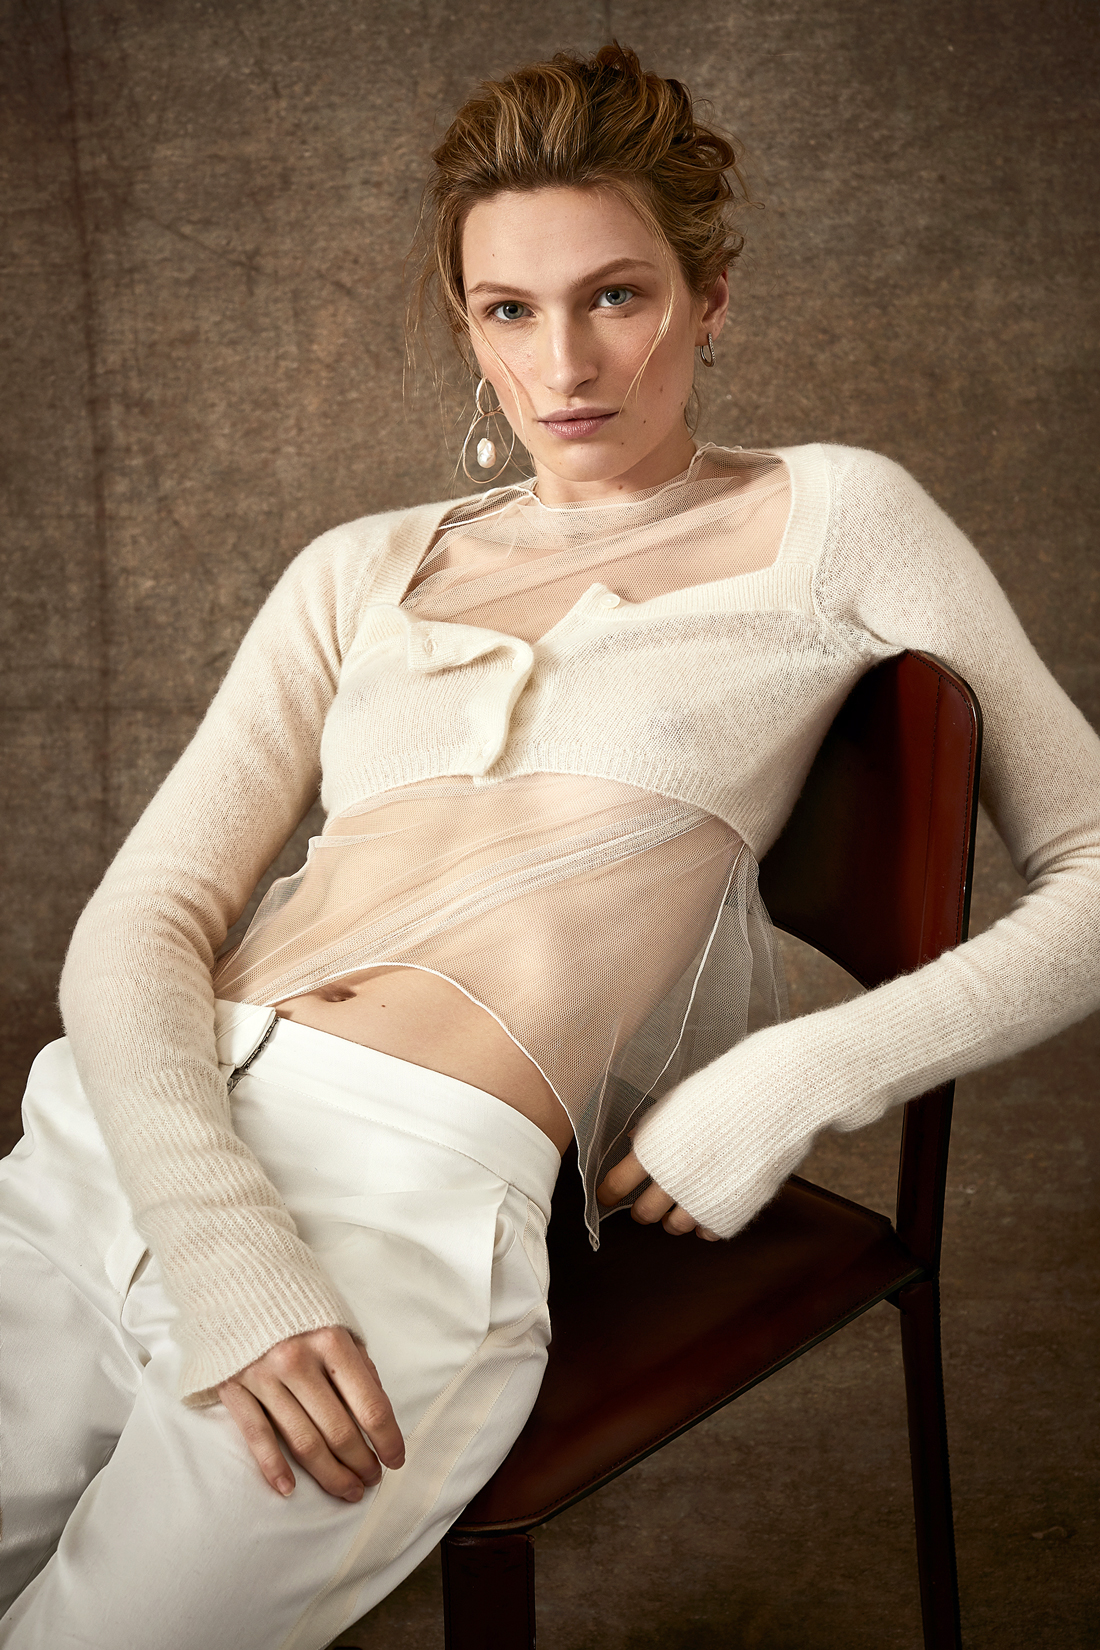 sheer underlay rib knit cropped long sleeve cardigan with pants wedding set Danielle Frankel Spring 2020